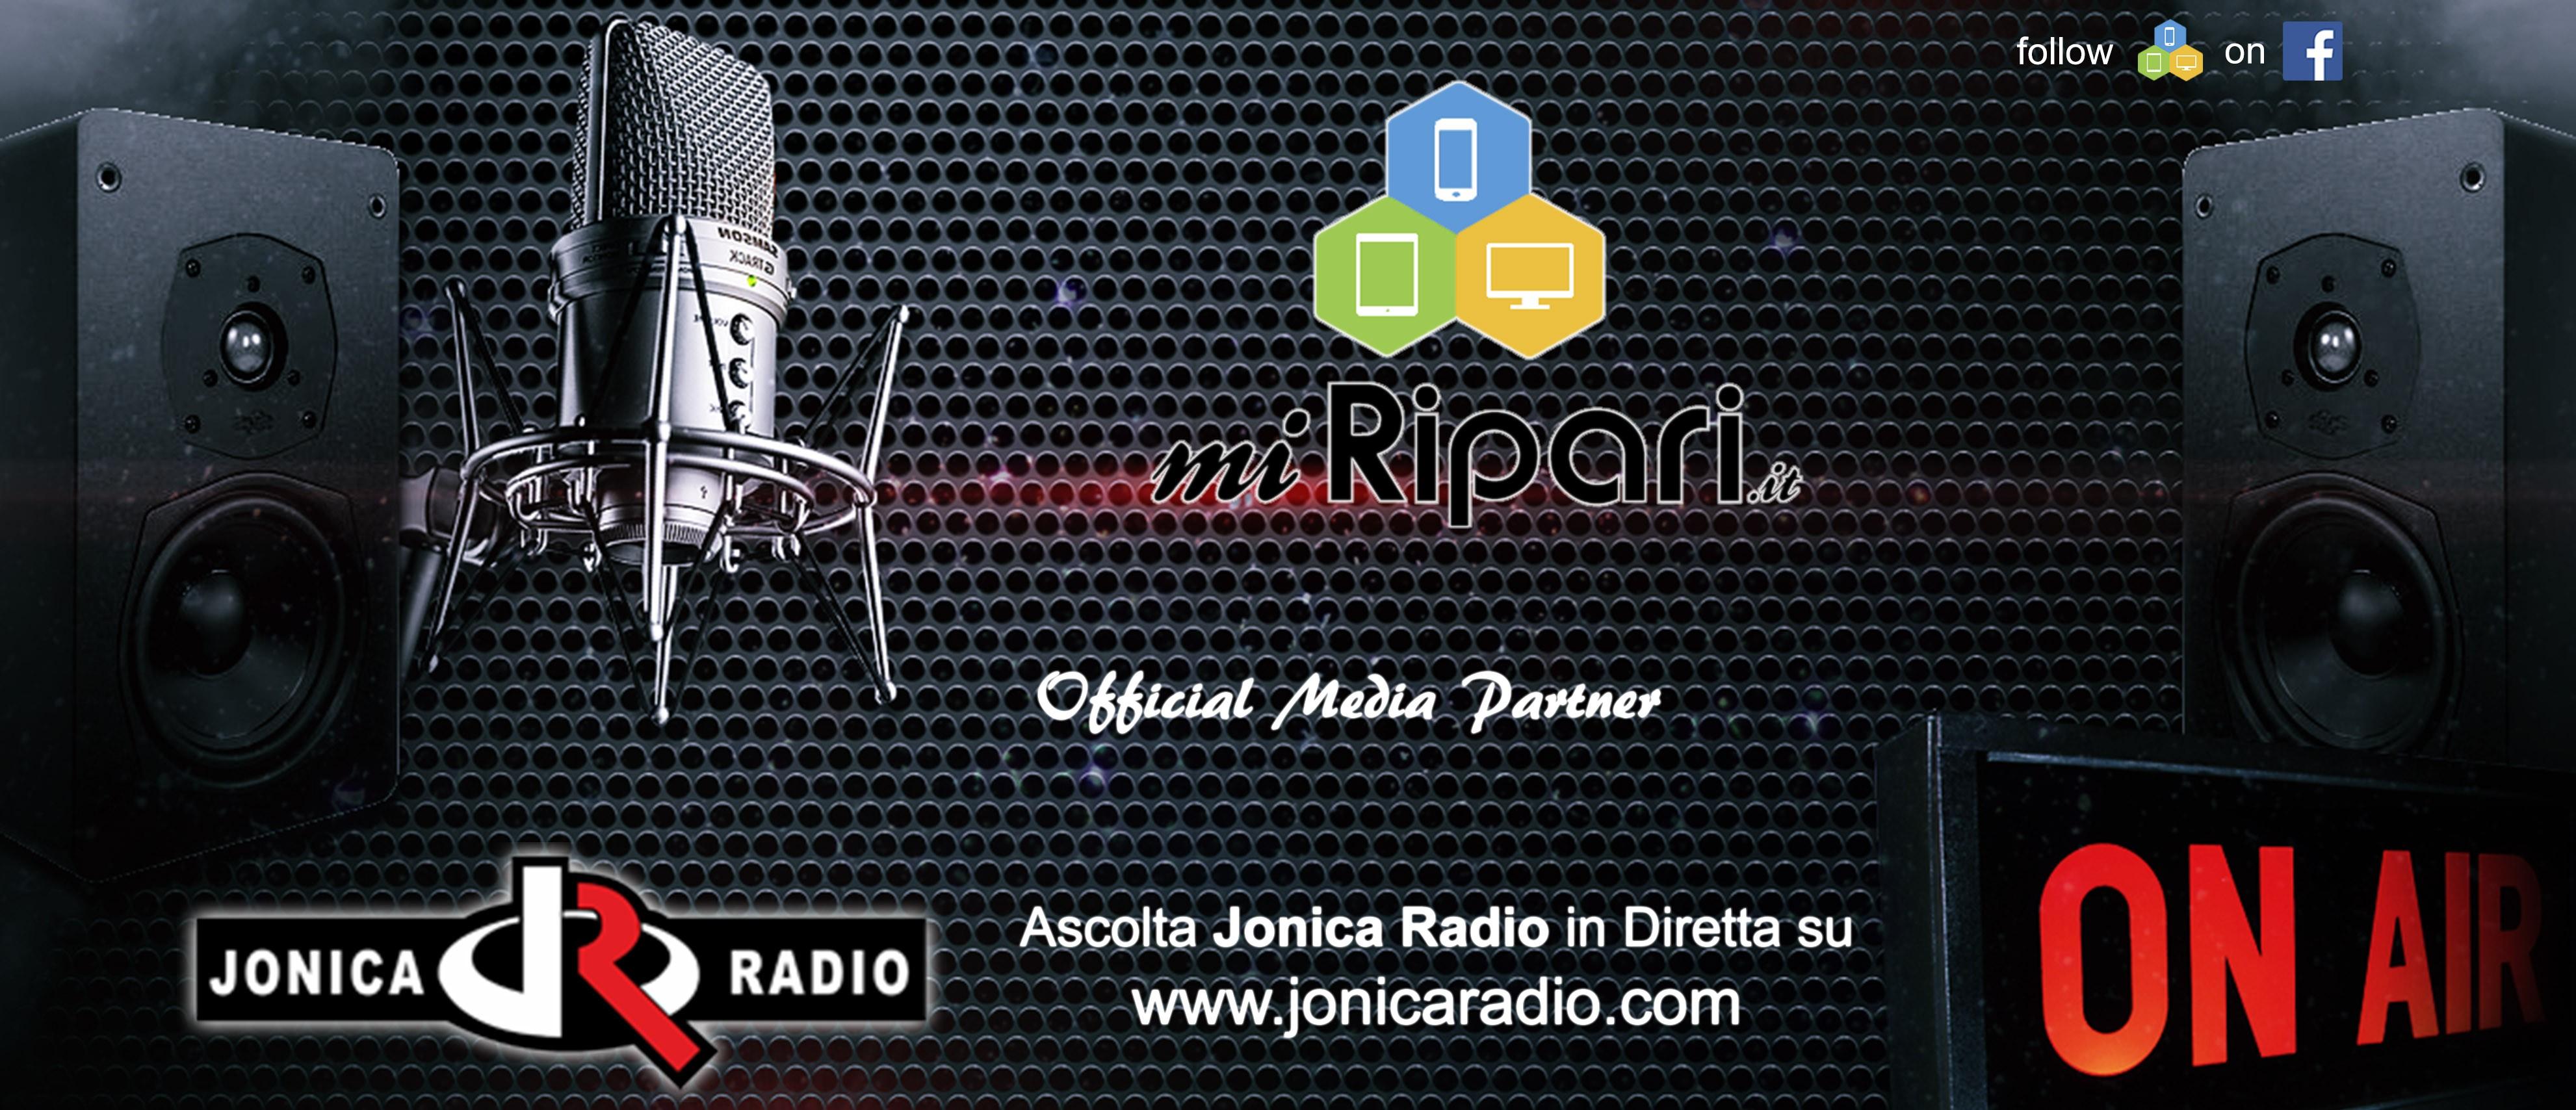 Jonica Radio